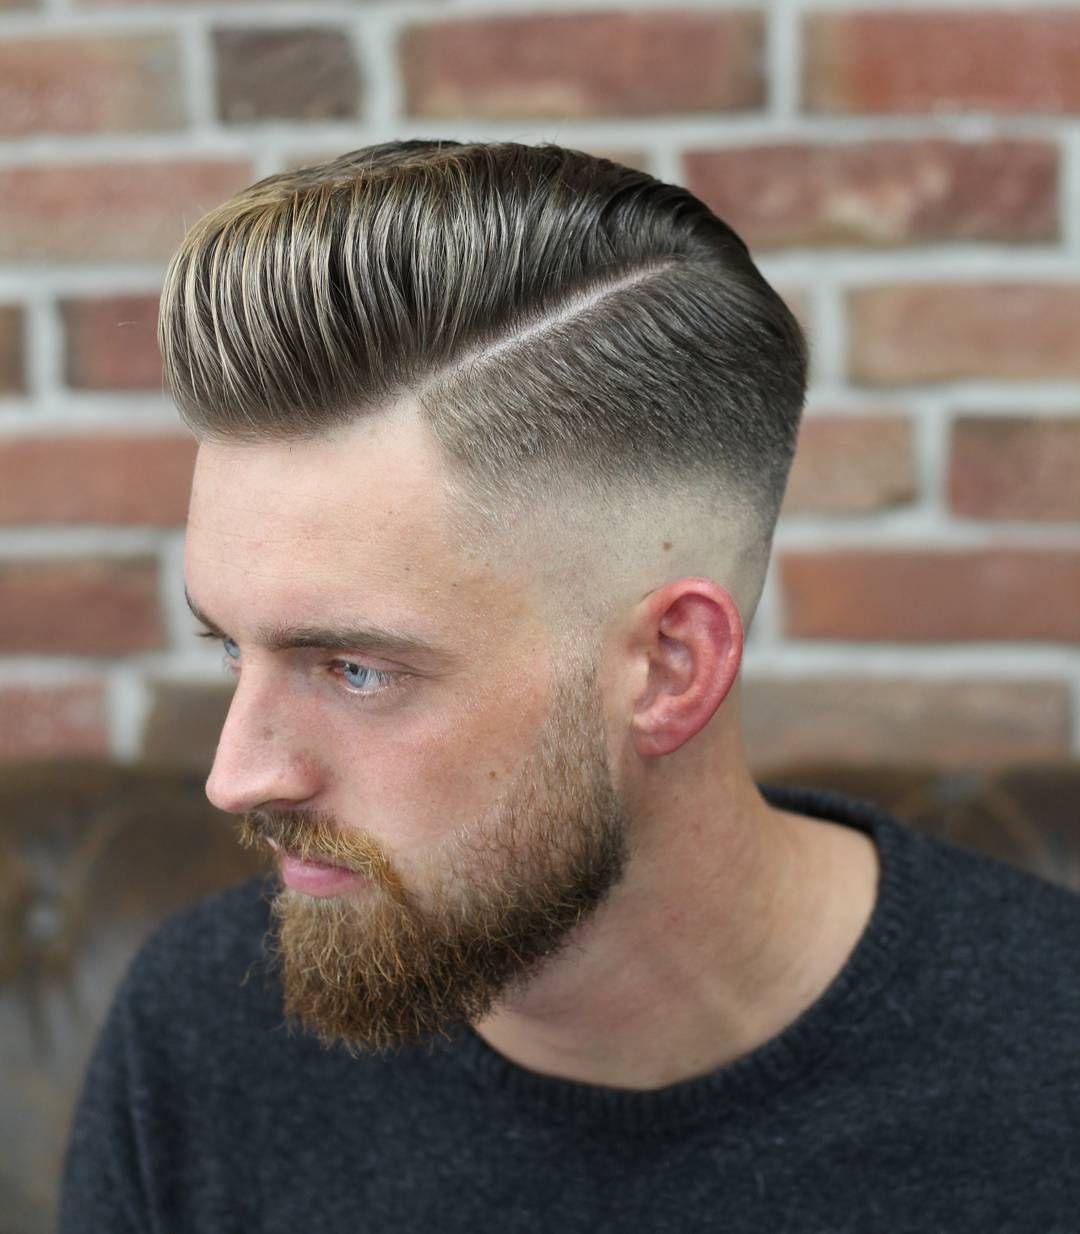 Cool Hairstyles For Men  メンズ髪型  Pinterest  Barber shop